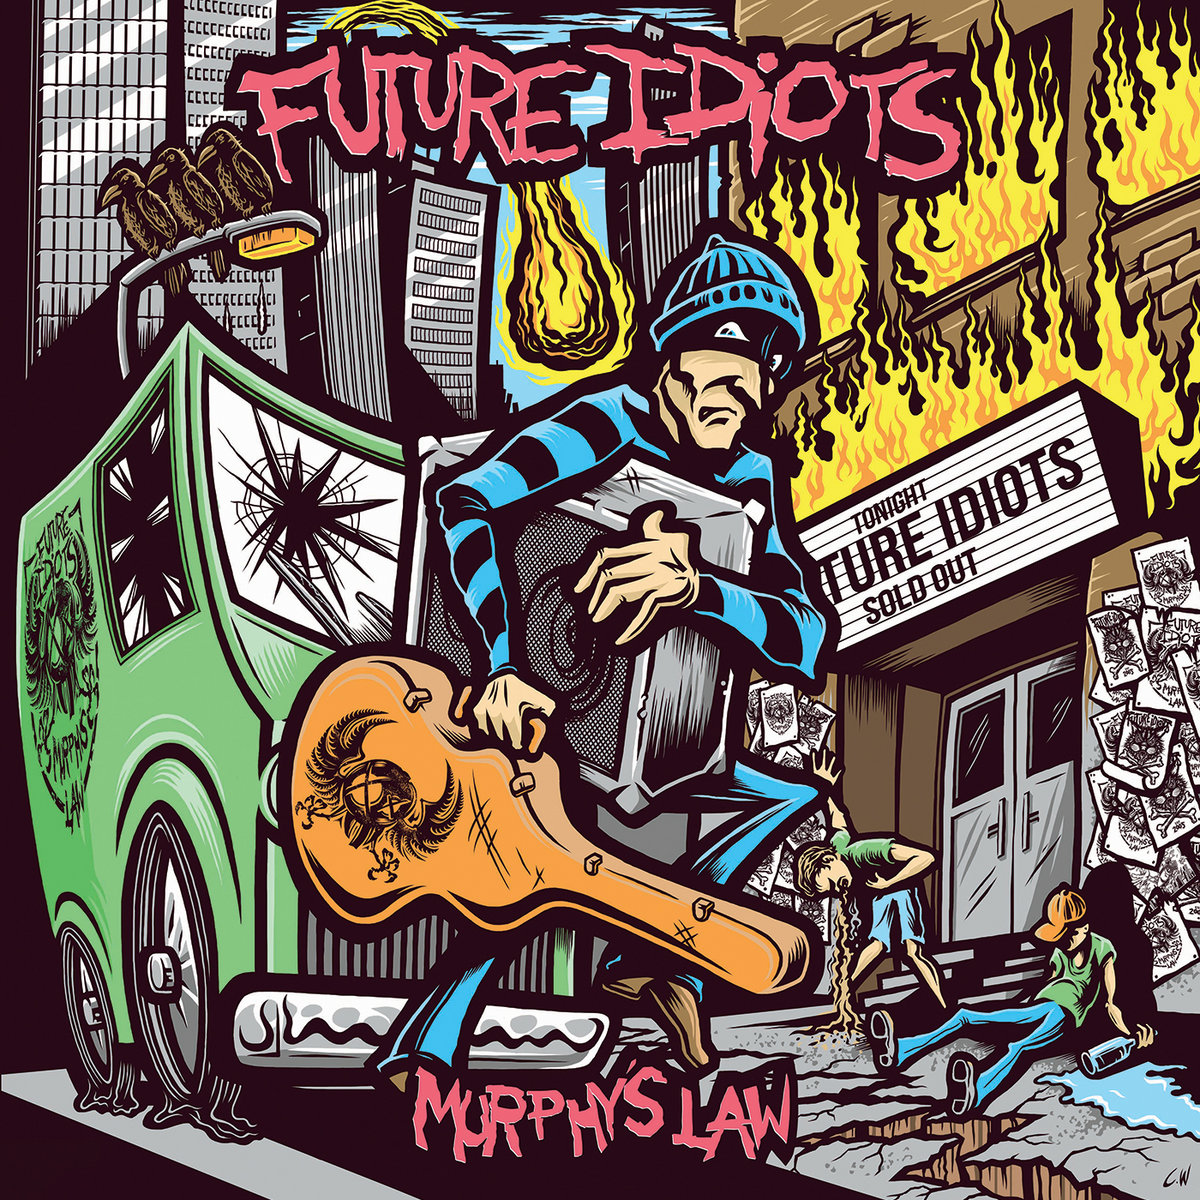 Murphy's Law | Future Idiots